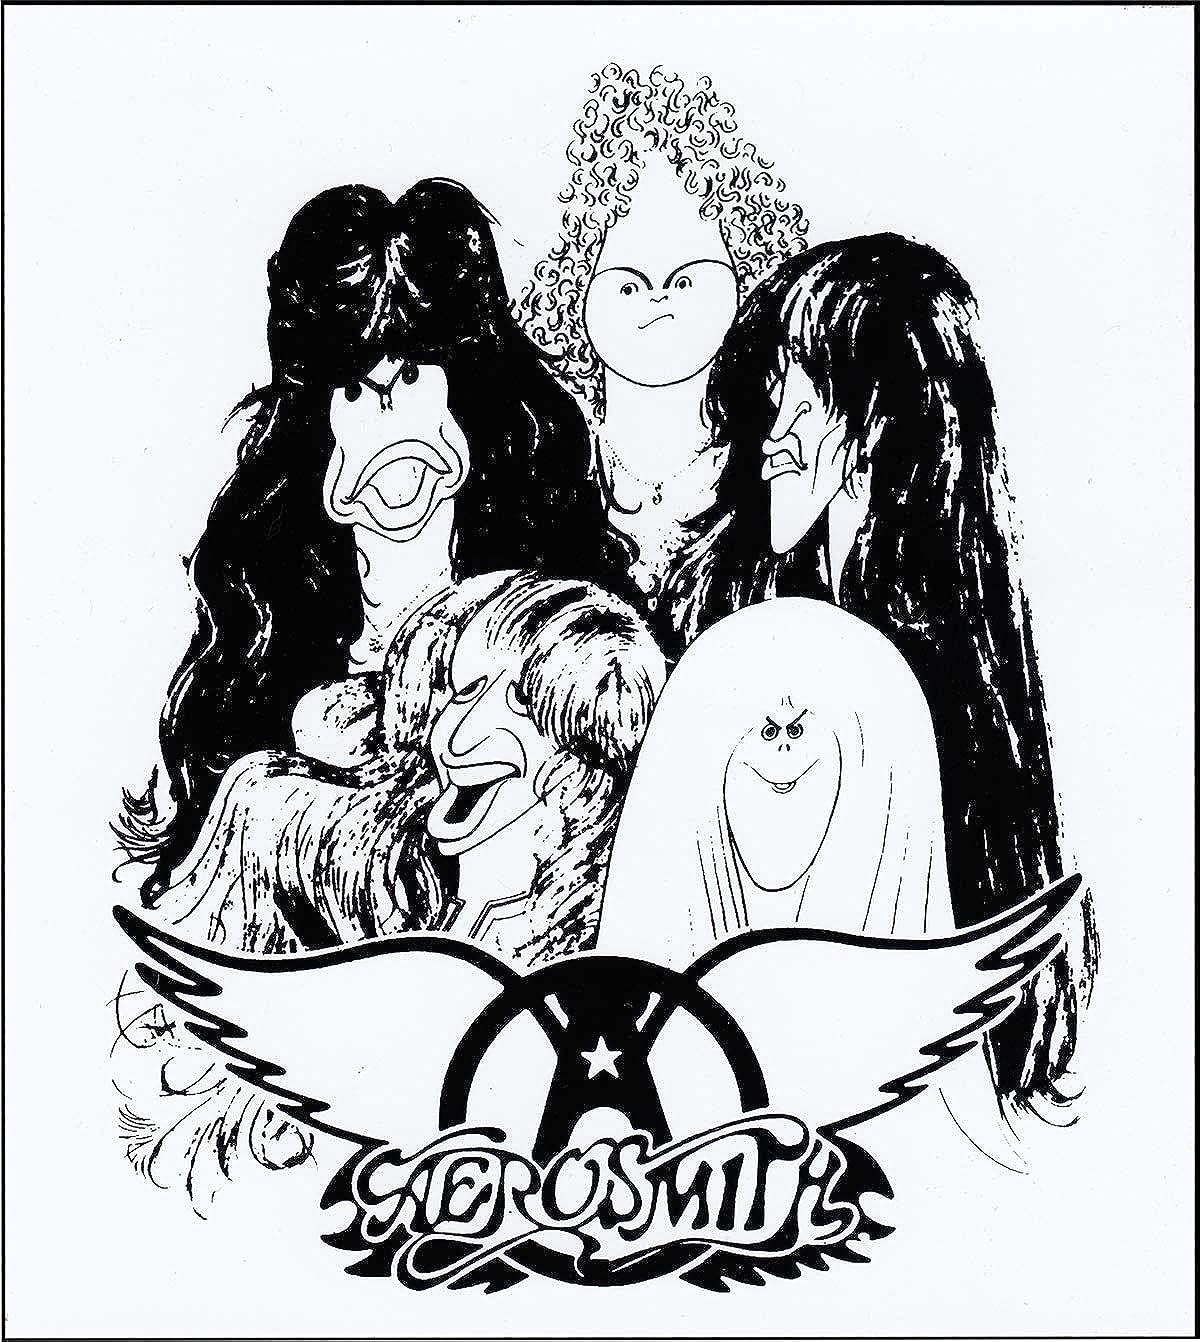 Aerosmith - Cartoon Group Shot - Sticker